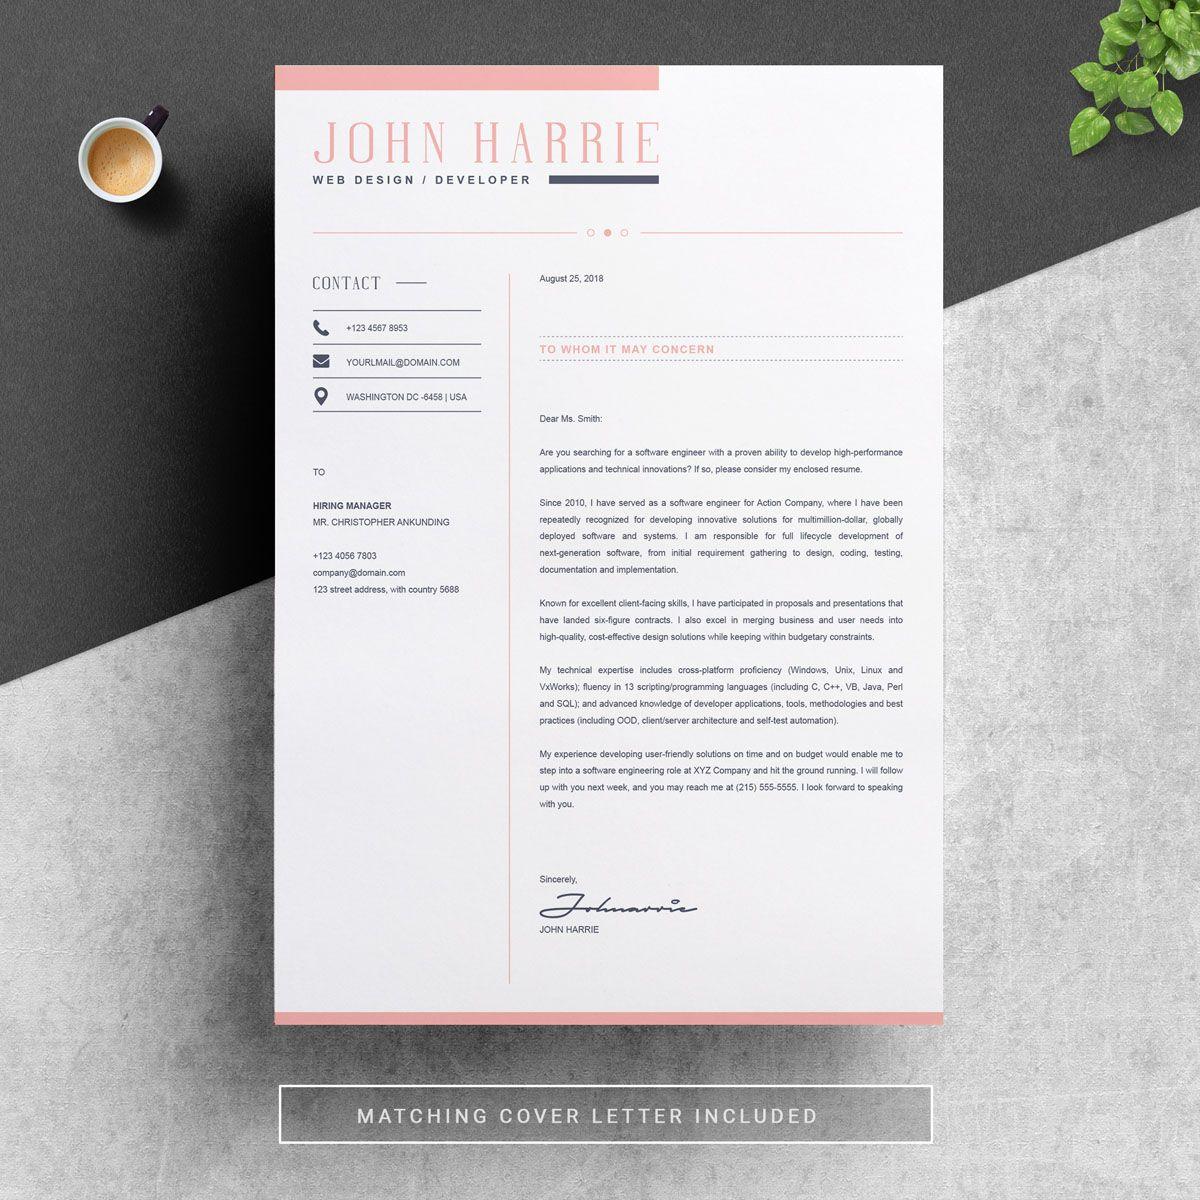 John Harrie Resume Template 78298 Resume template